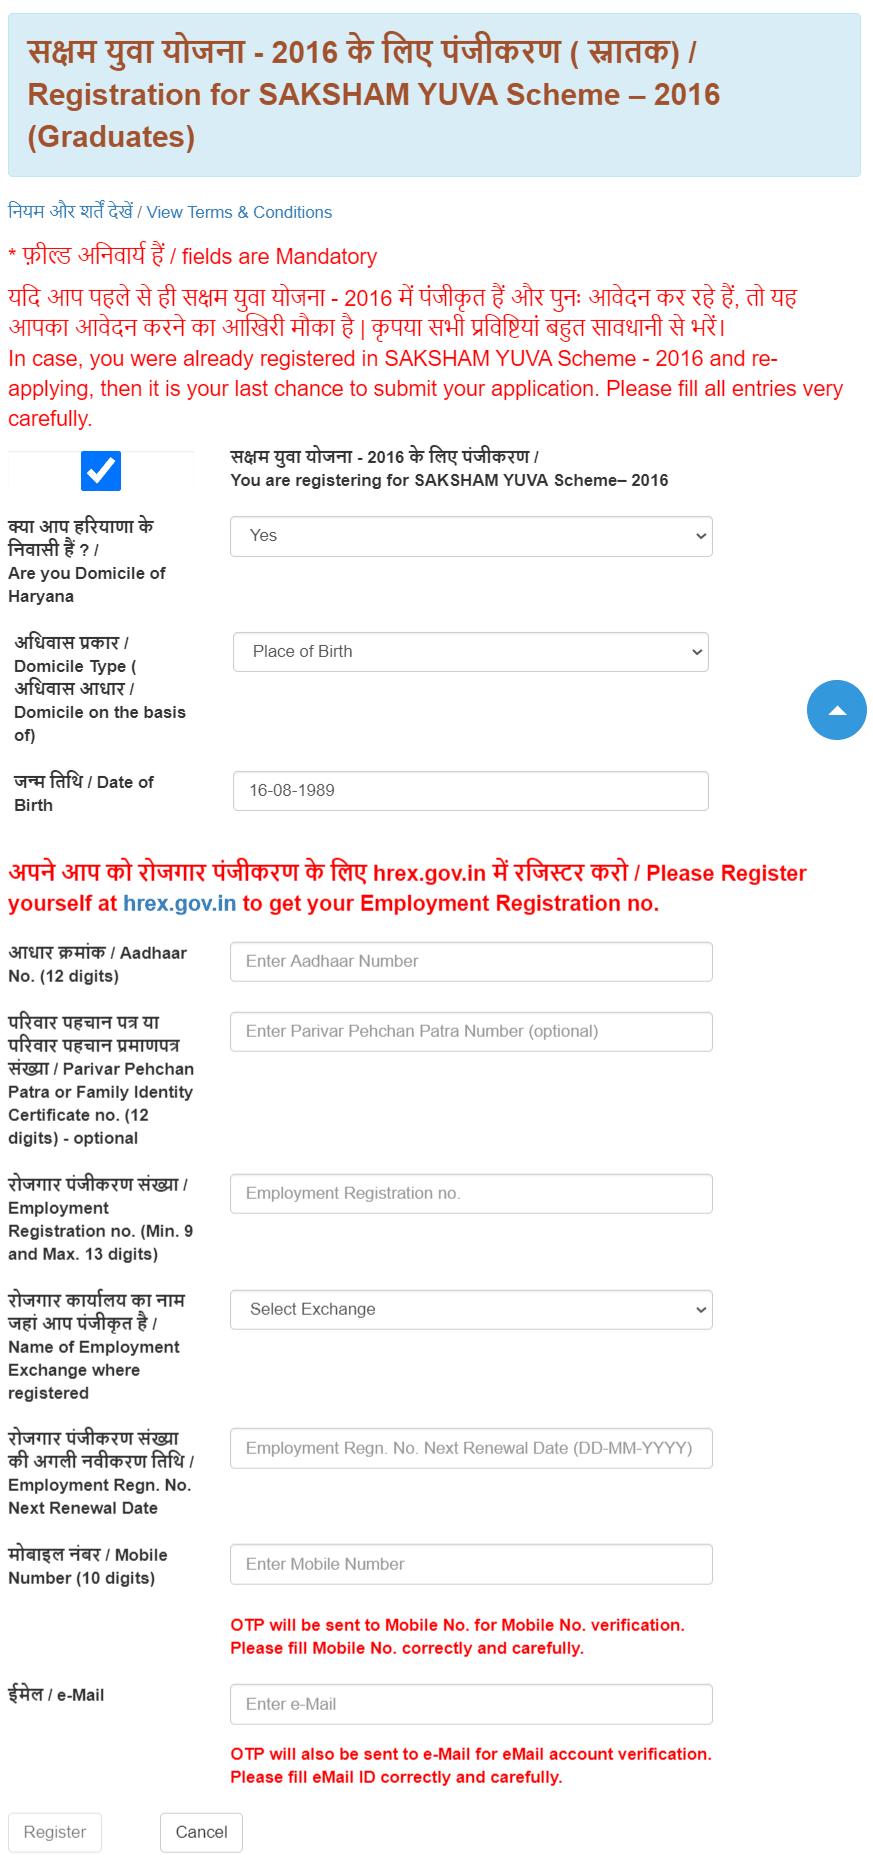 Saksham Yojana Registration Form